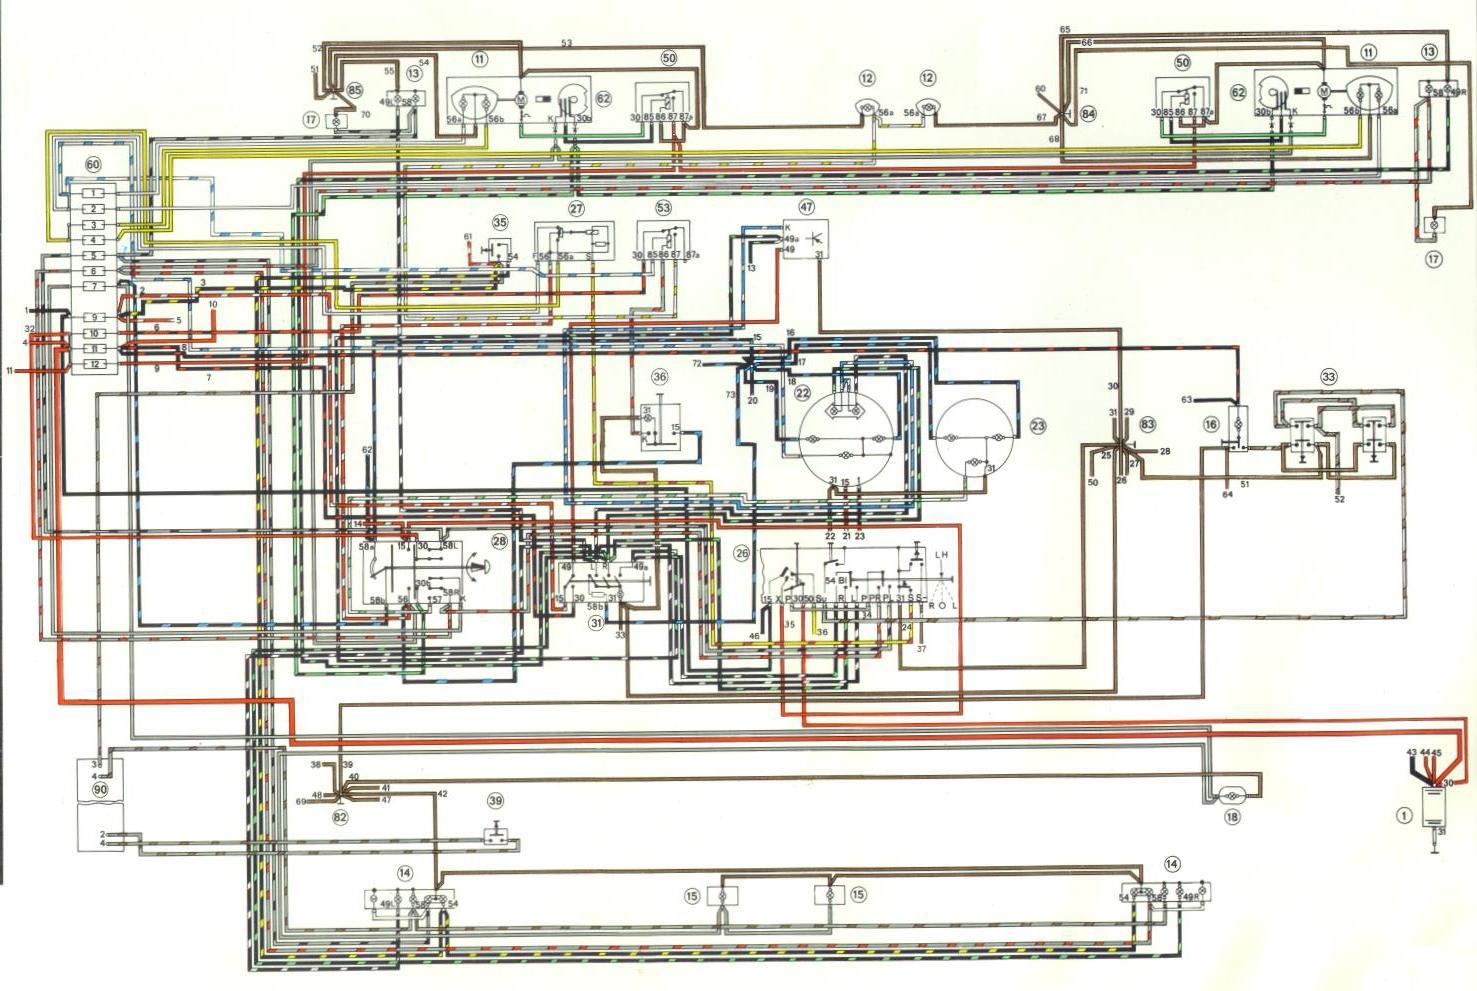 914world.com   1974 wiring/current flow diagram  914 world